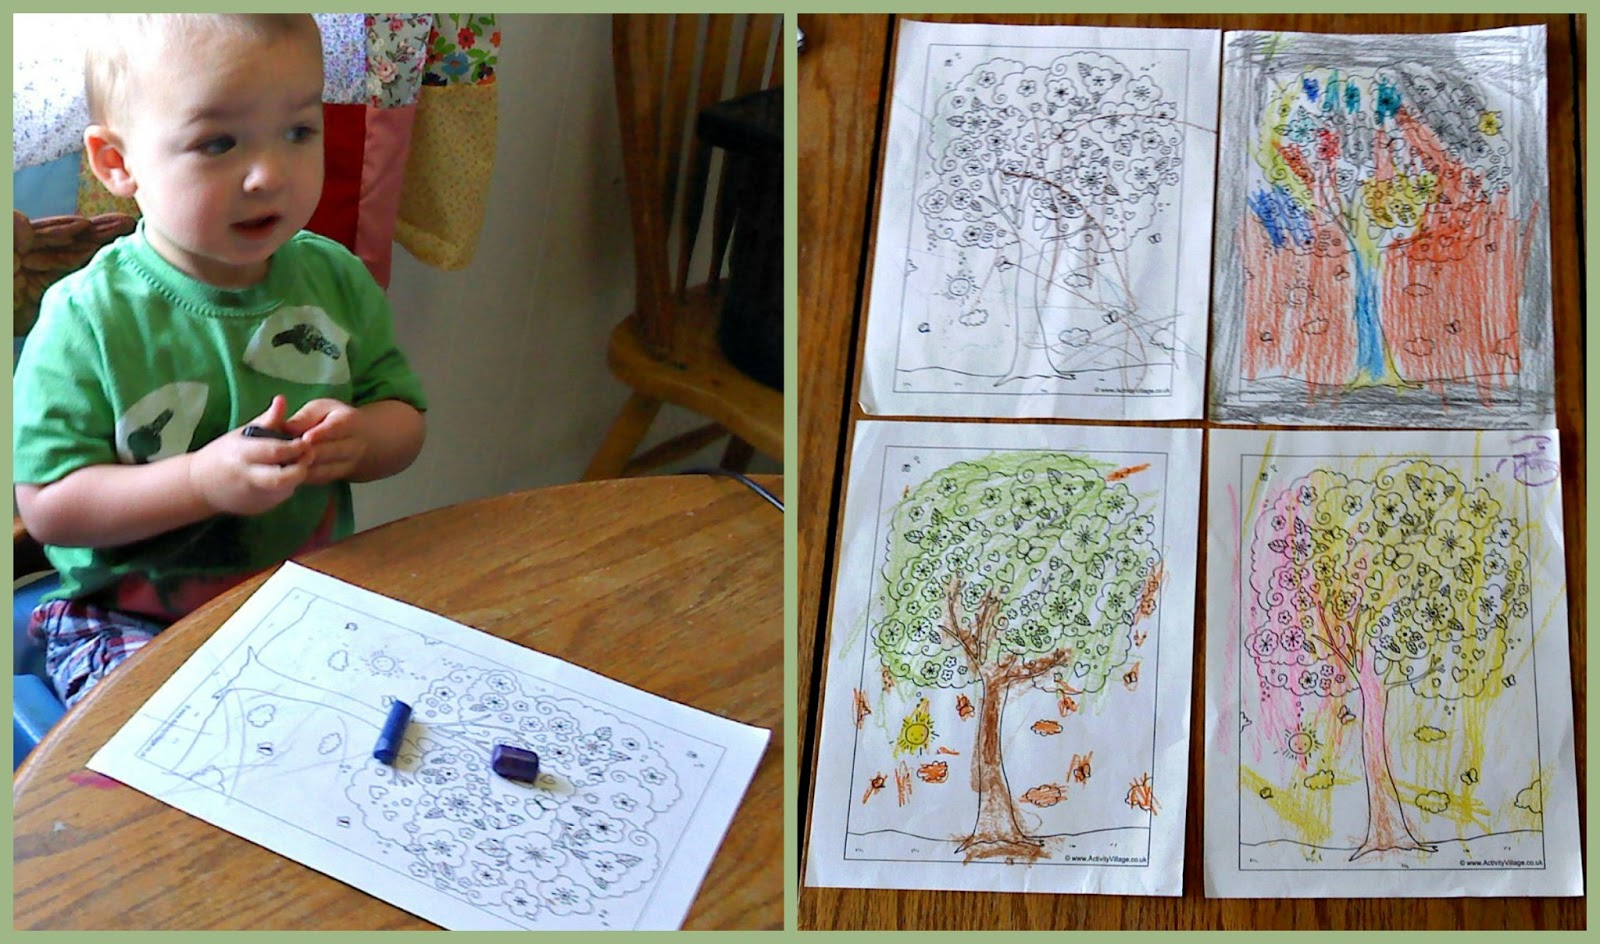 Coloring Pages DLTK's Crafts for Kids